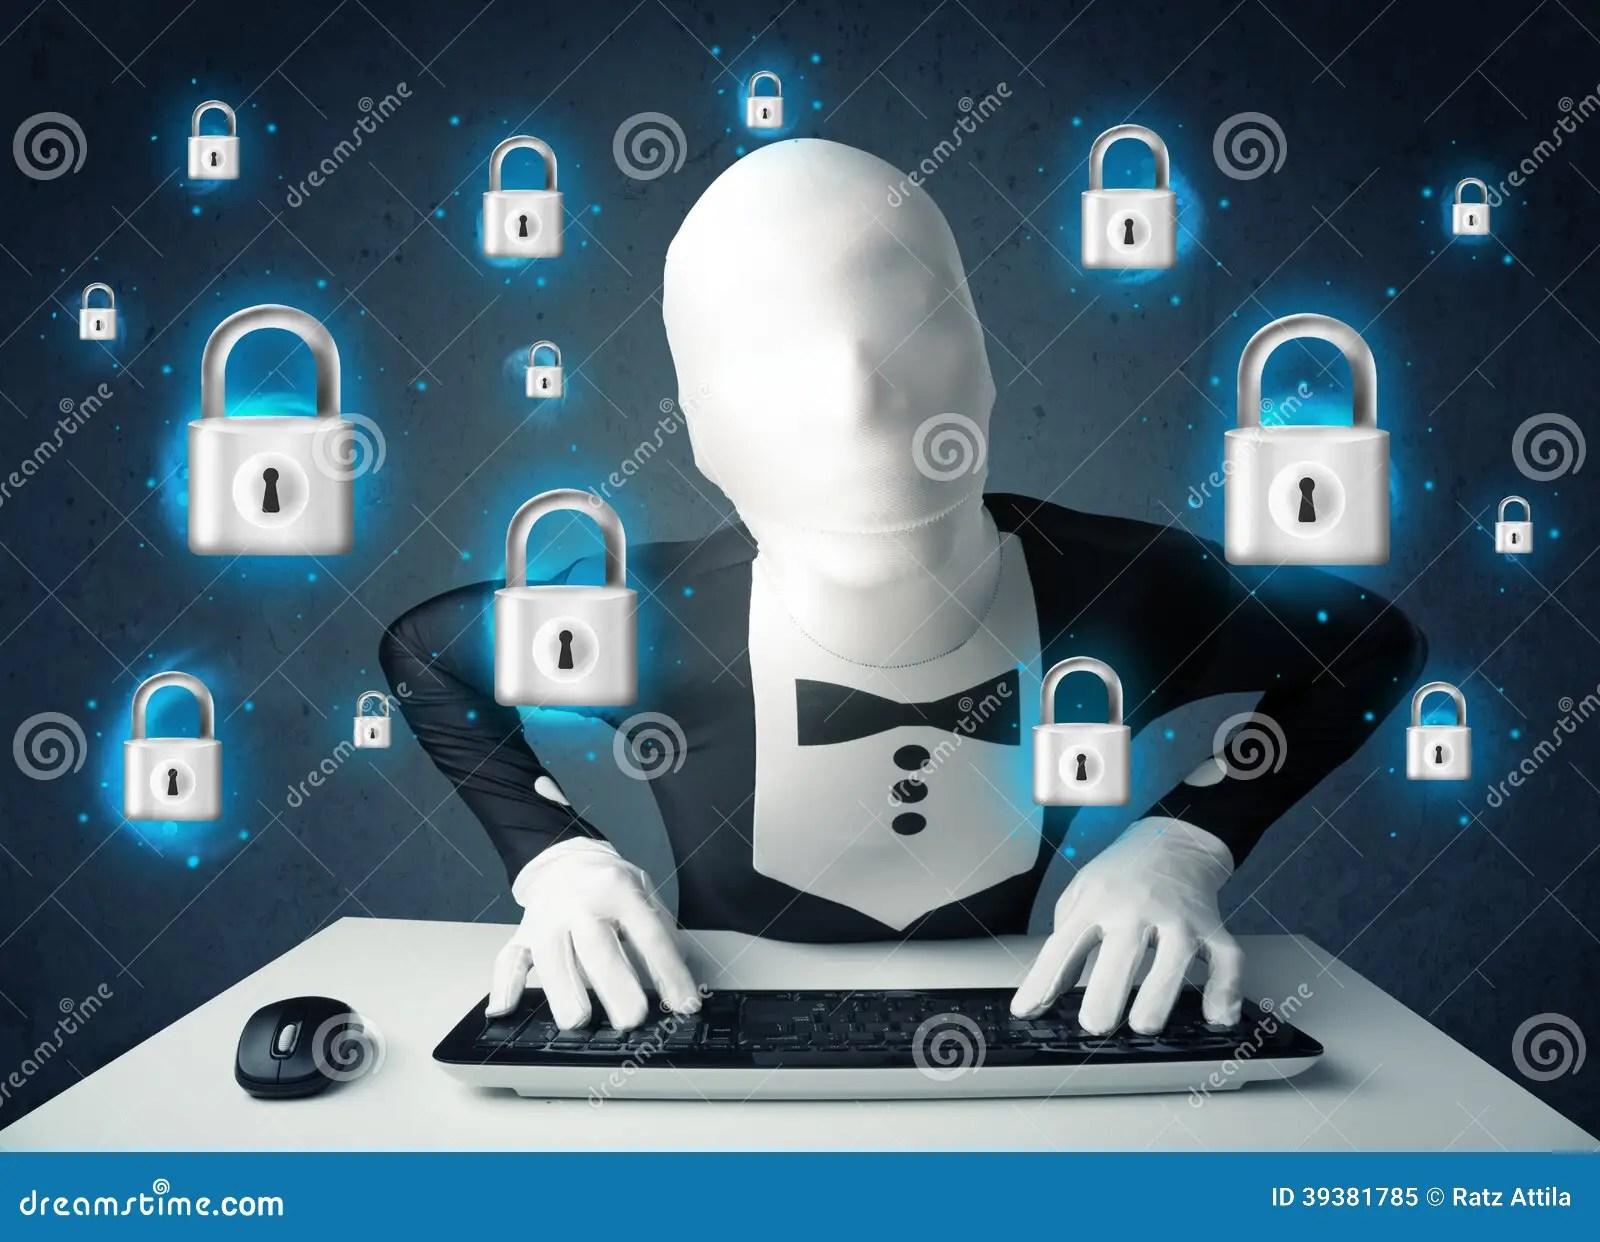 https://i1.wp.com/thumbs.dreamstime.com/z/pirate-informatique-dans-le-d%C3%A9guisement-avec-des-symboles-et-des-ic-nes-virtuels-de-serrure-39381785.jpg